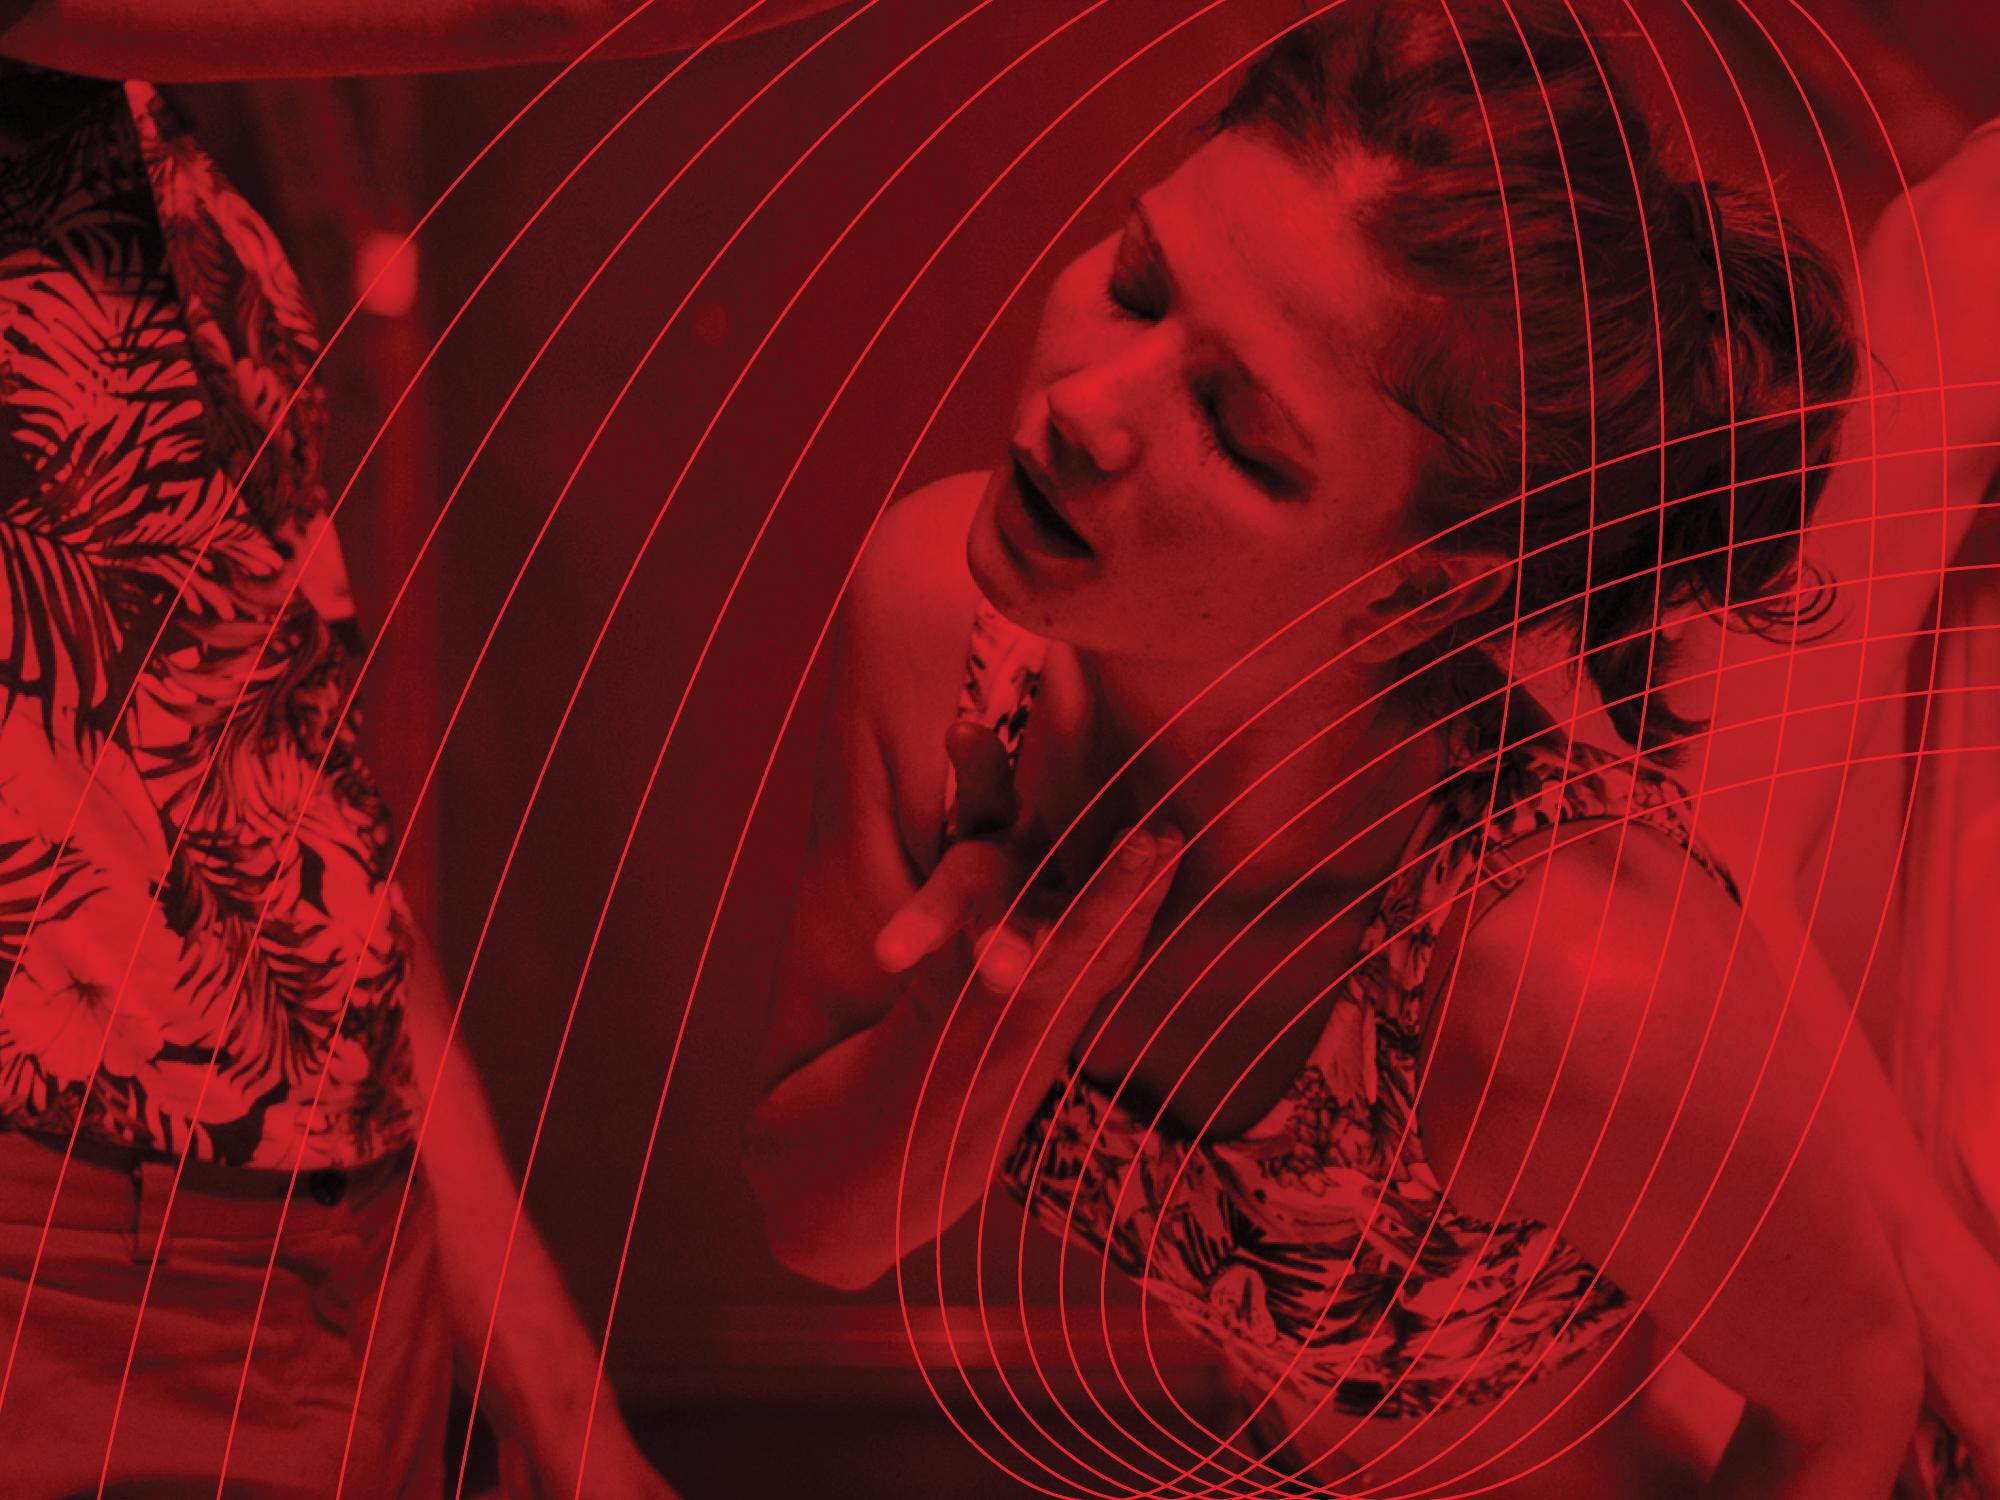 Cover image: Aerowaves